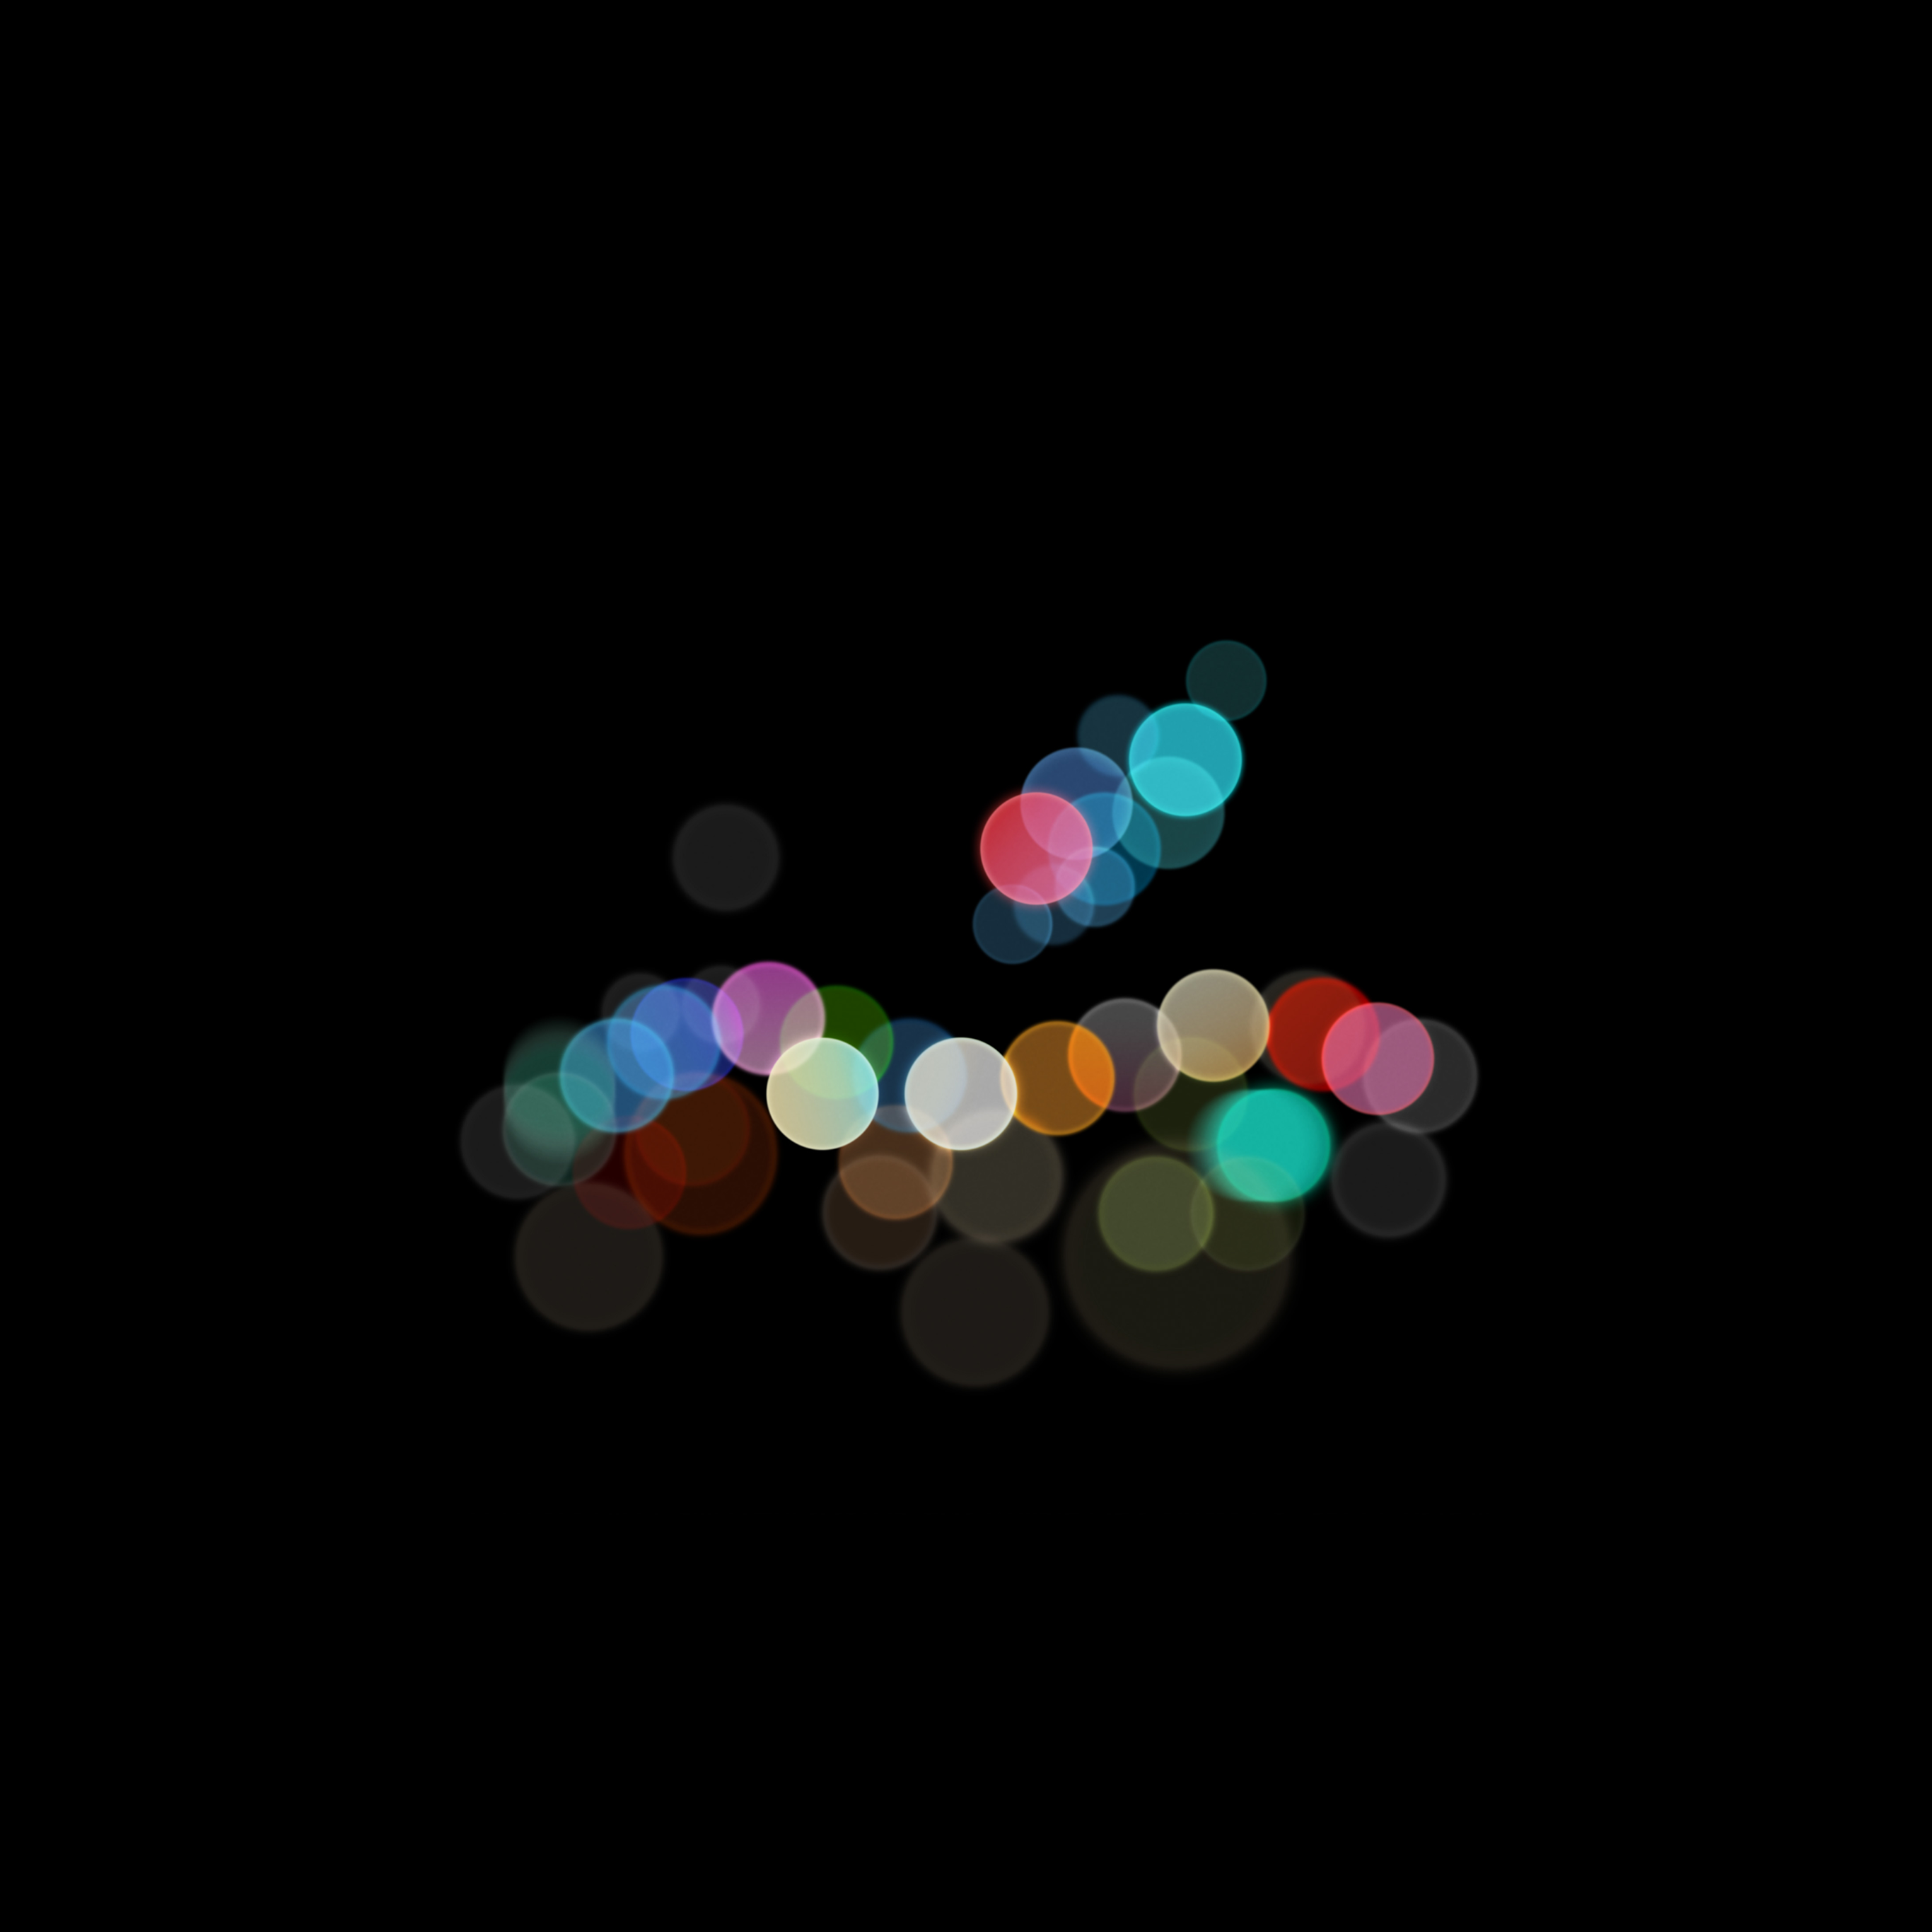 Apple September 7 event wallpaper ar7 ipad